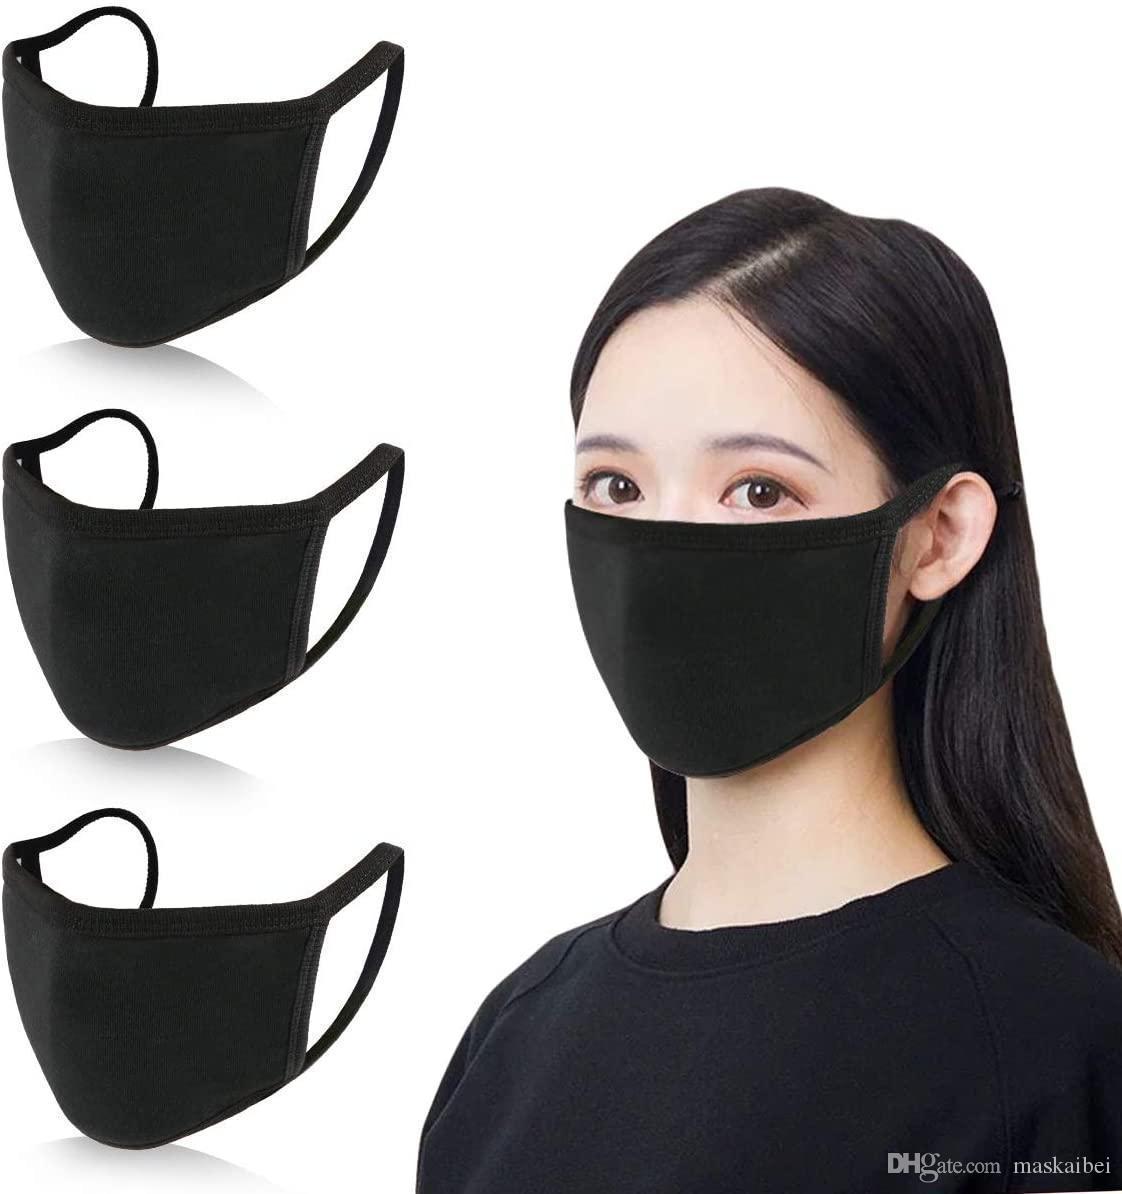 Designer anti-poeira Cotton Mouth Máscara Facial máscaras pretas de protecção Unisex descartável máscara da mulher do homem Vestindo preto Moda transporte rápido